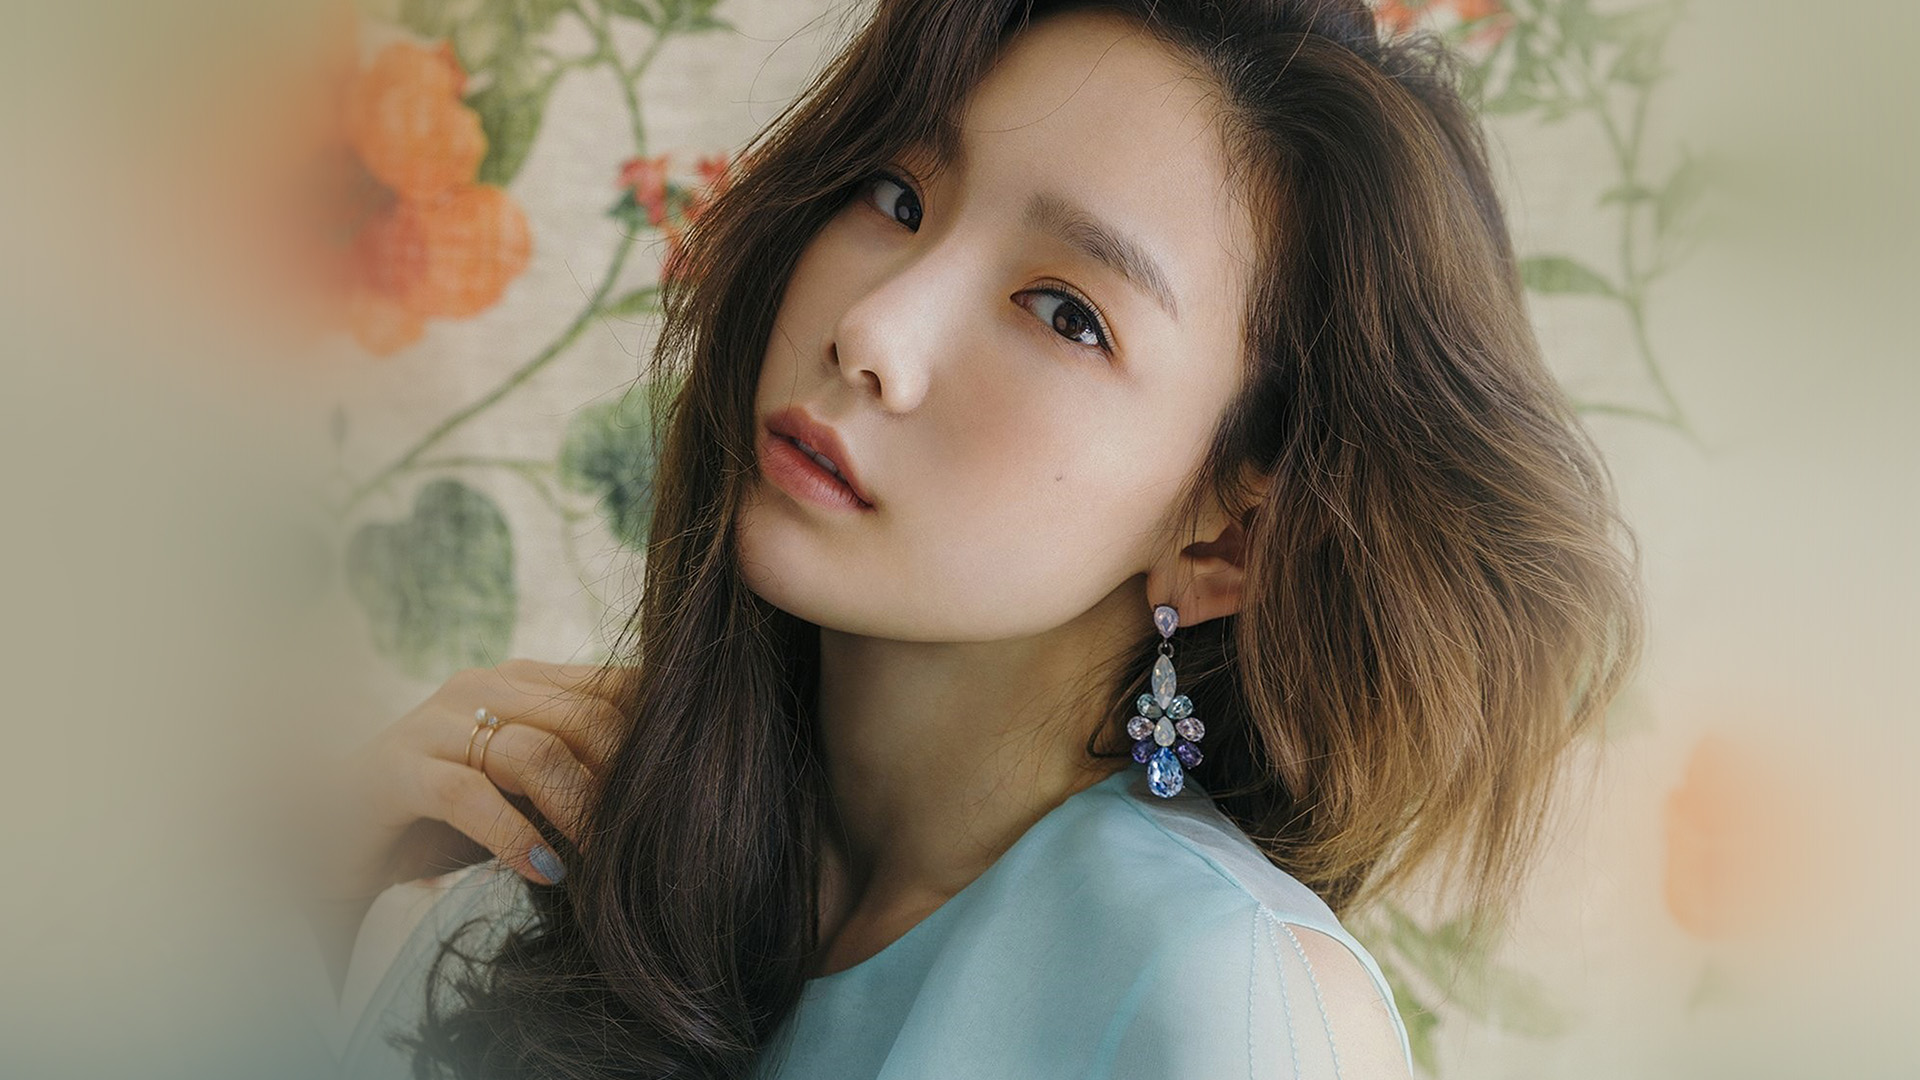 Simple Girl Wallpaper Com Hm37 Kpop Snsd Taeyeon Flower Girl Wallpaper